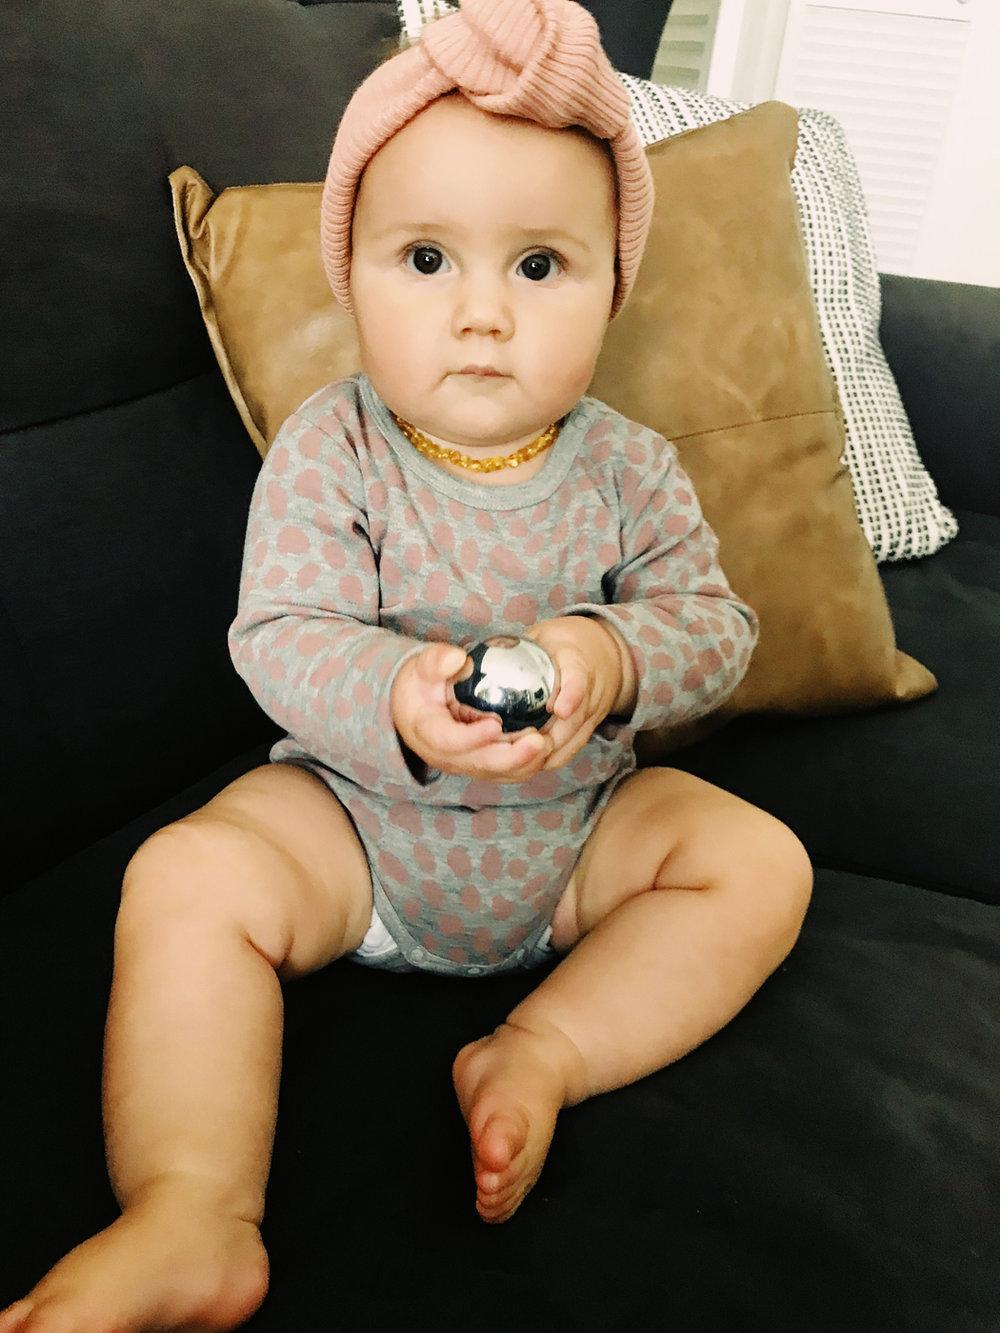 vegan baby 9 months old 01.jpg